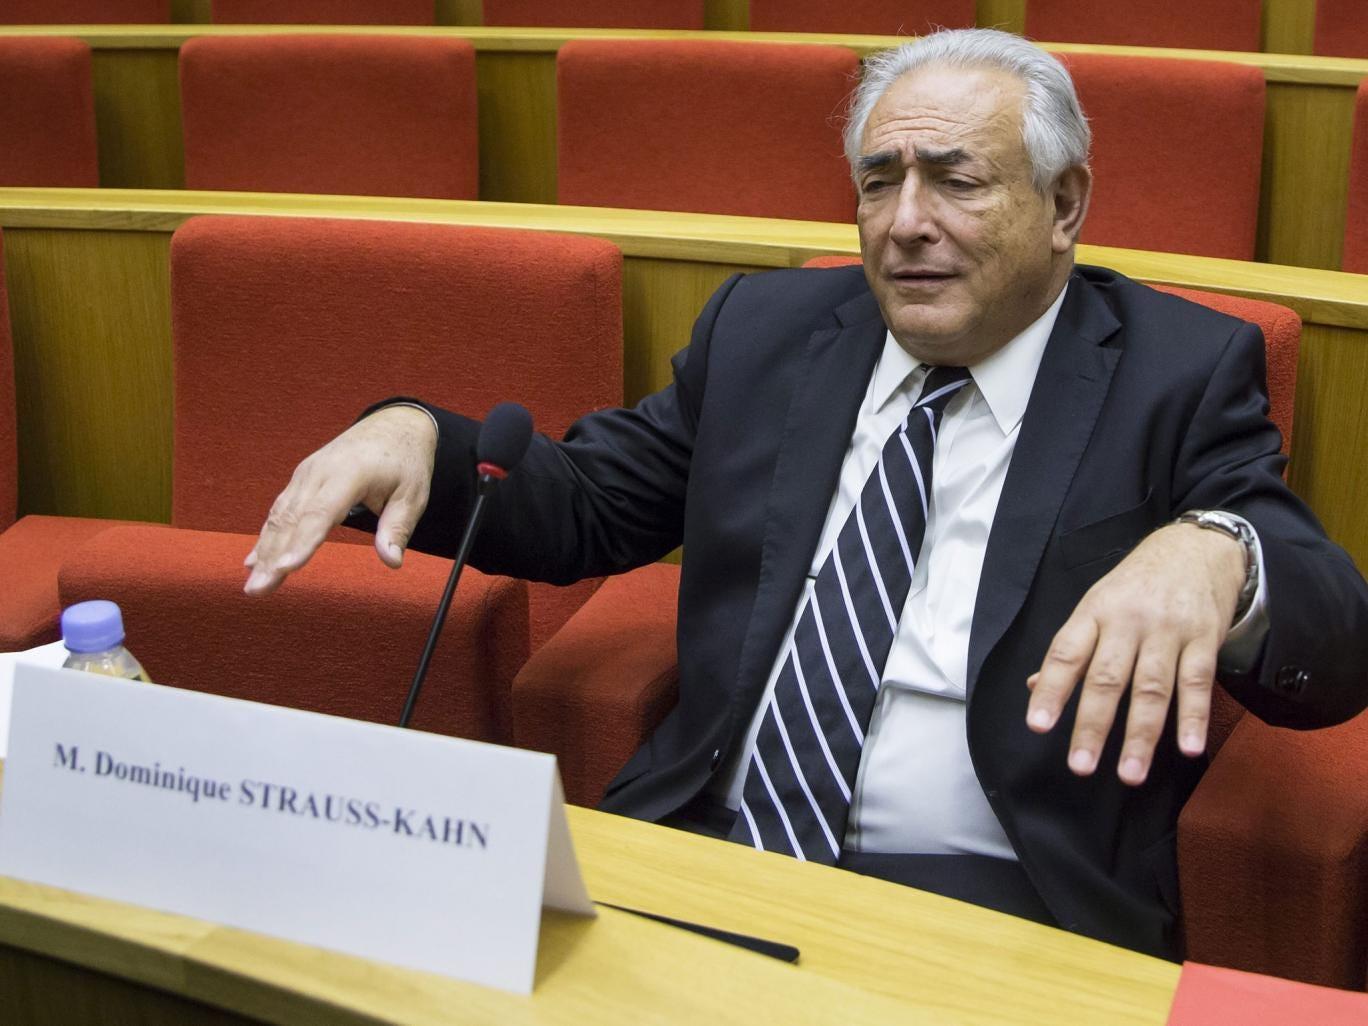 Disgraced French politician Dominique Strauss-Kahn